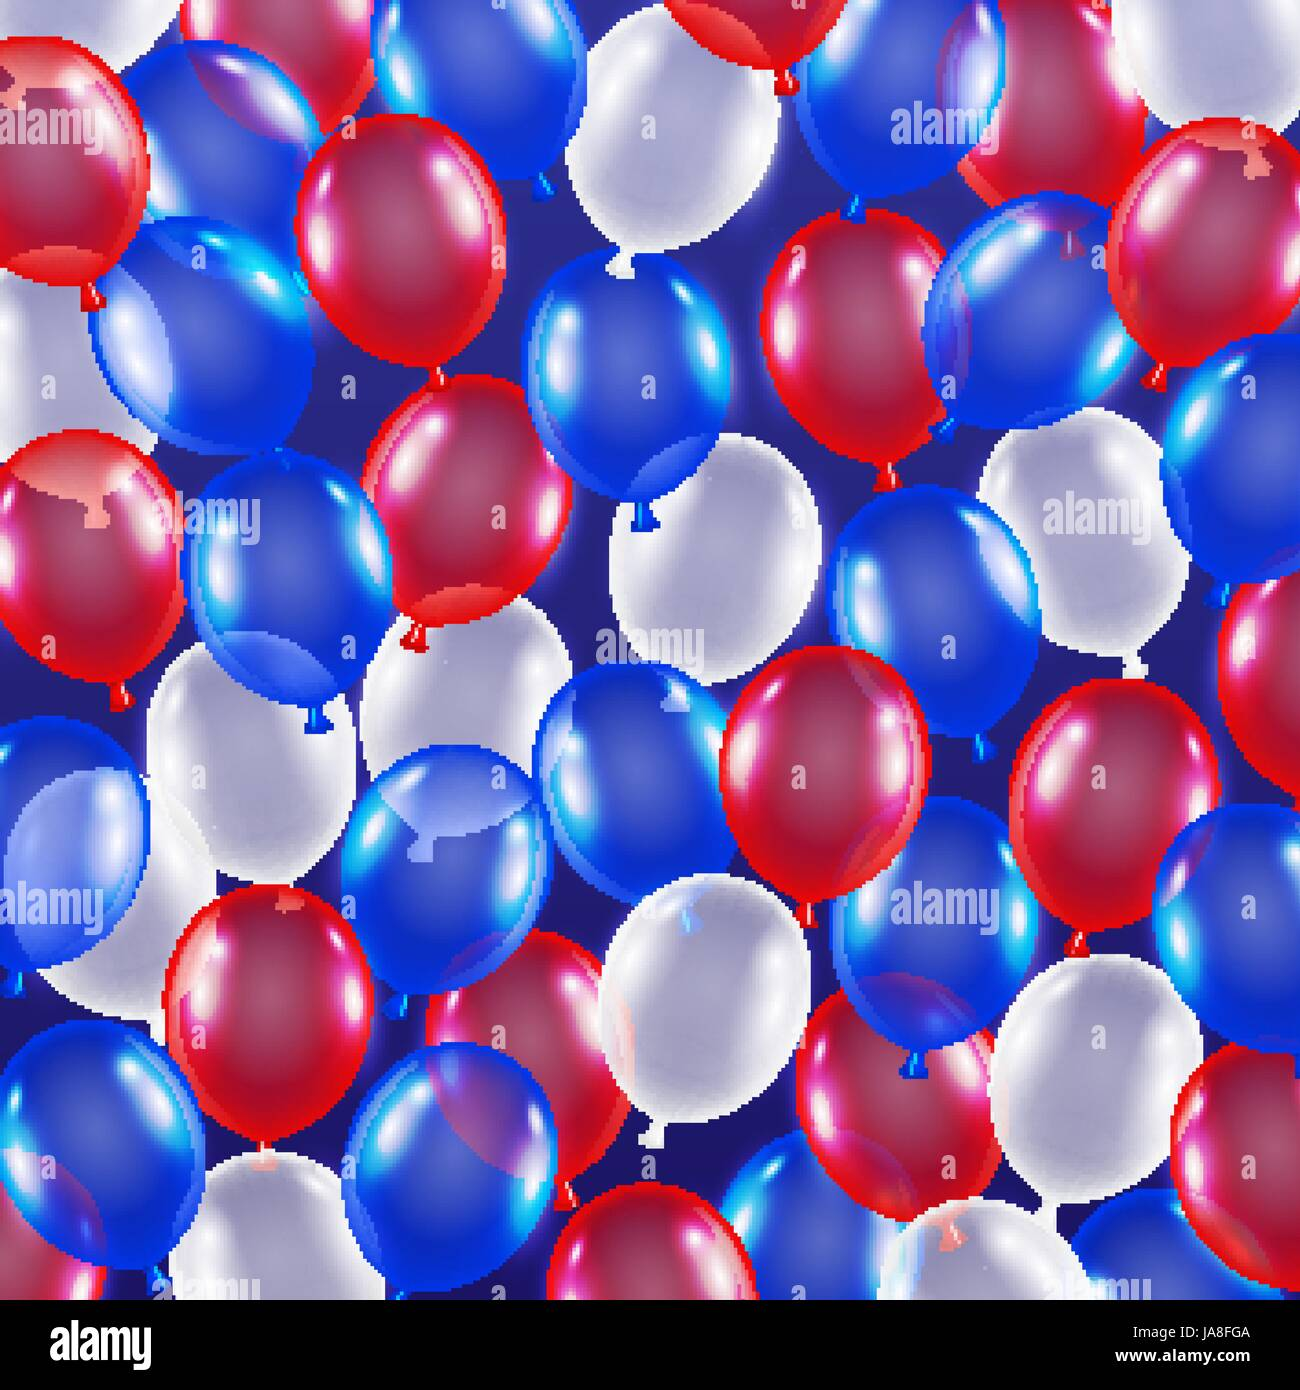 Red Blue White Balloon Background Usa Flag Theme Stock Vector Image Art Alamy